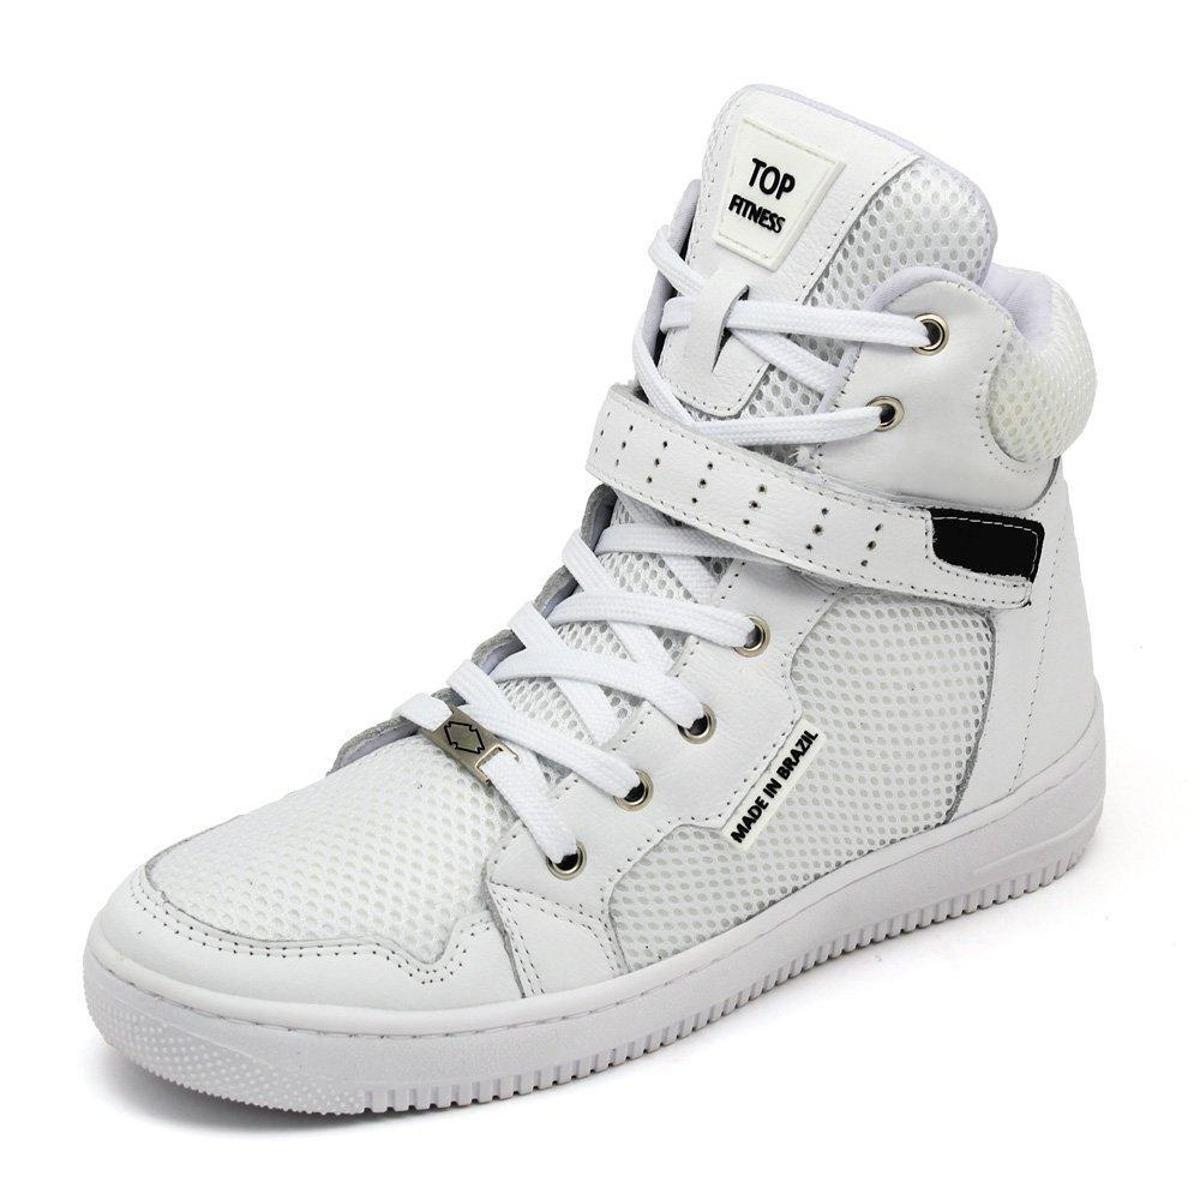 Tênis sneaker fitness azul bic e branco - R$ 199.90, cor